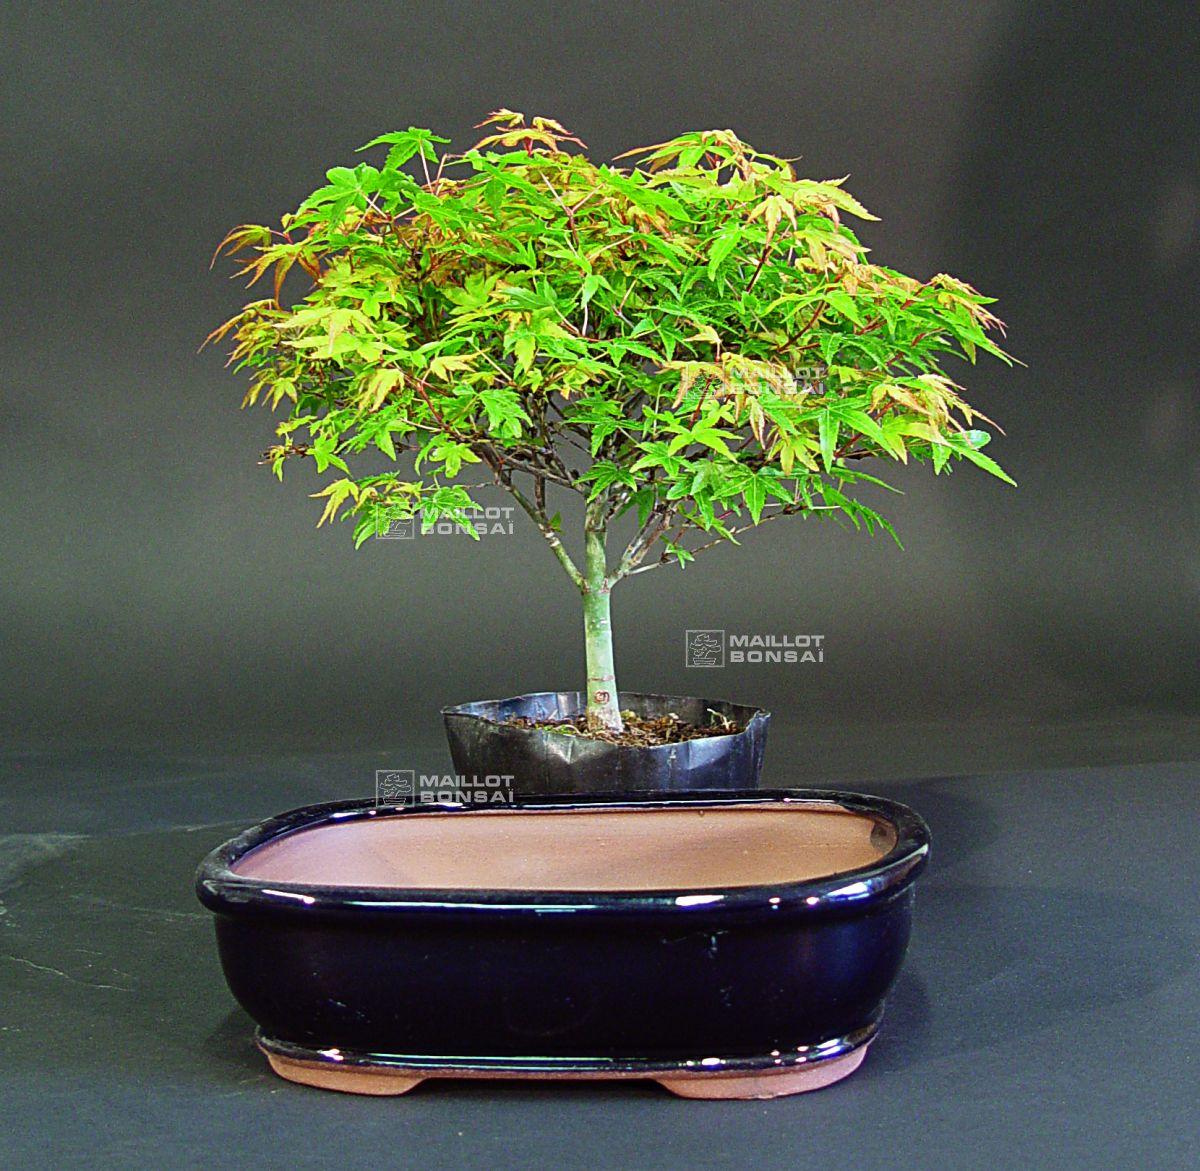 les lots de 2 de 3 lot pot bleu et erable palm kiyo hime de maillot bonsa la boutique. Black Bedroom Furniture Sets. Home Design Ideas